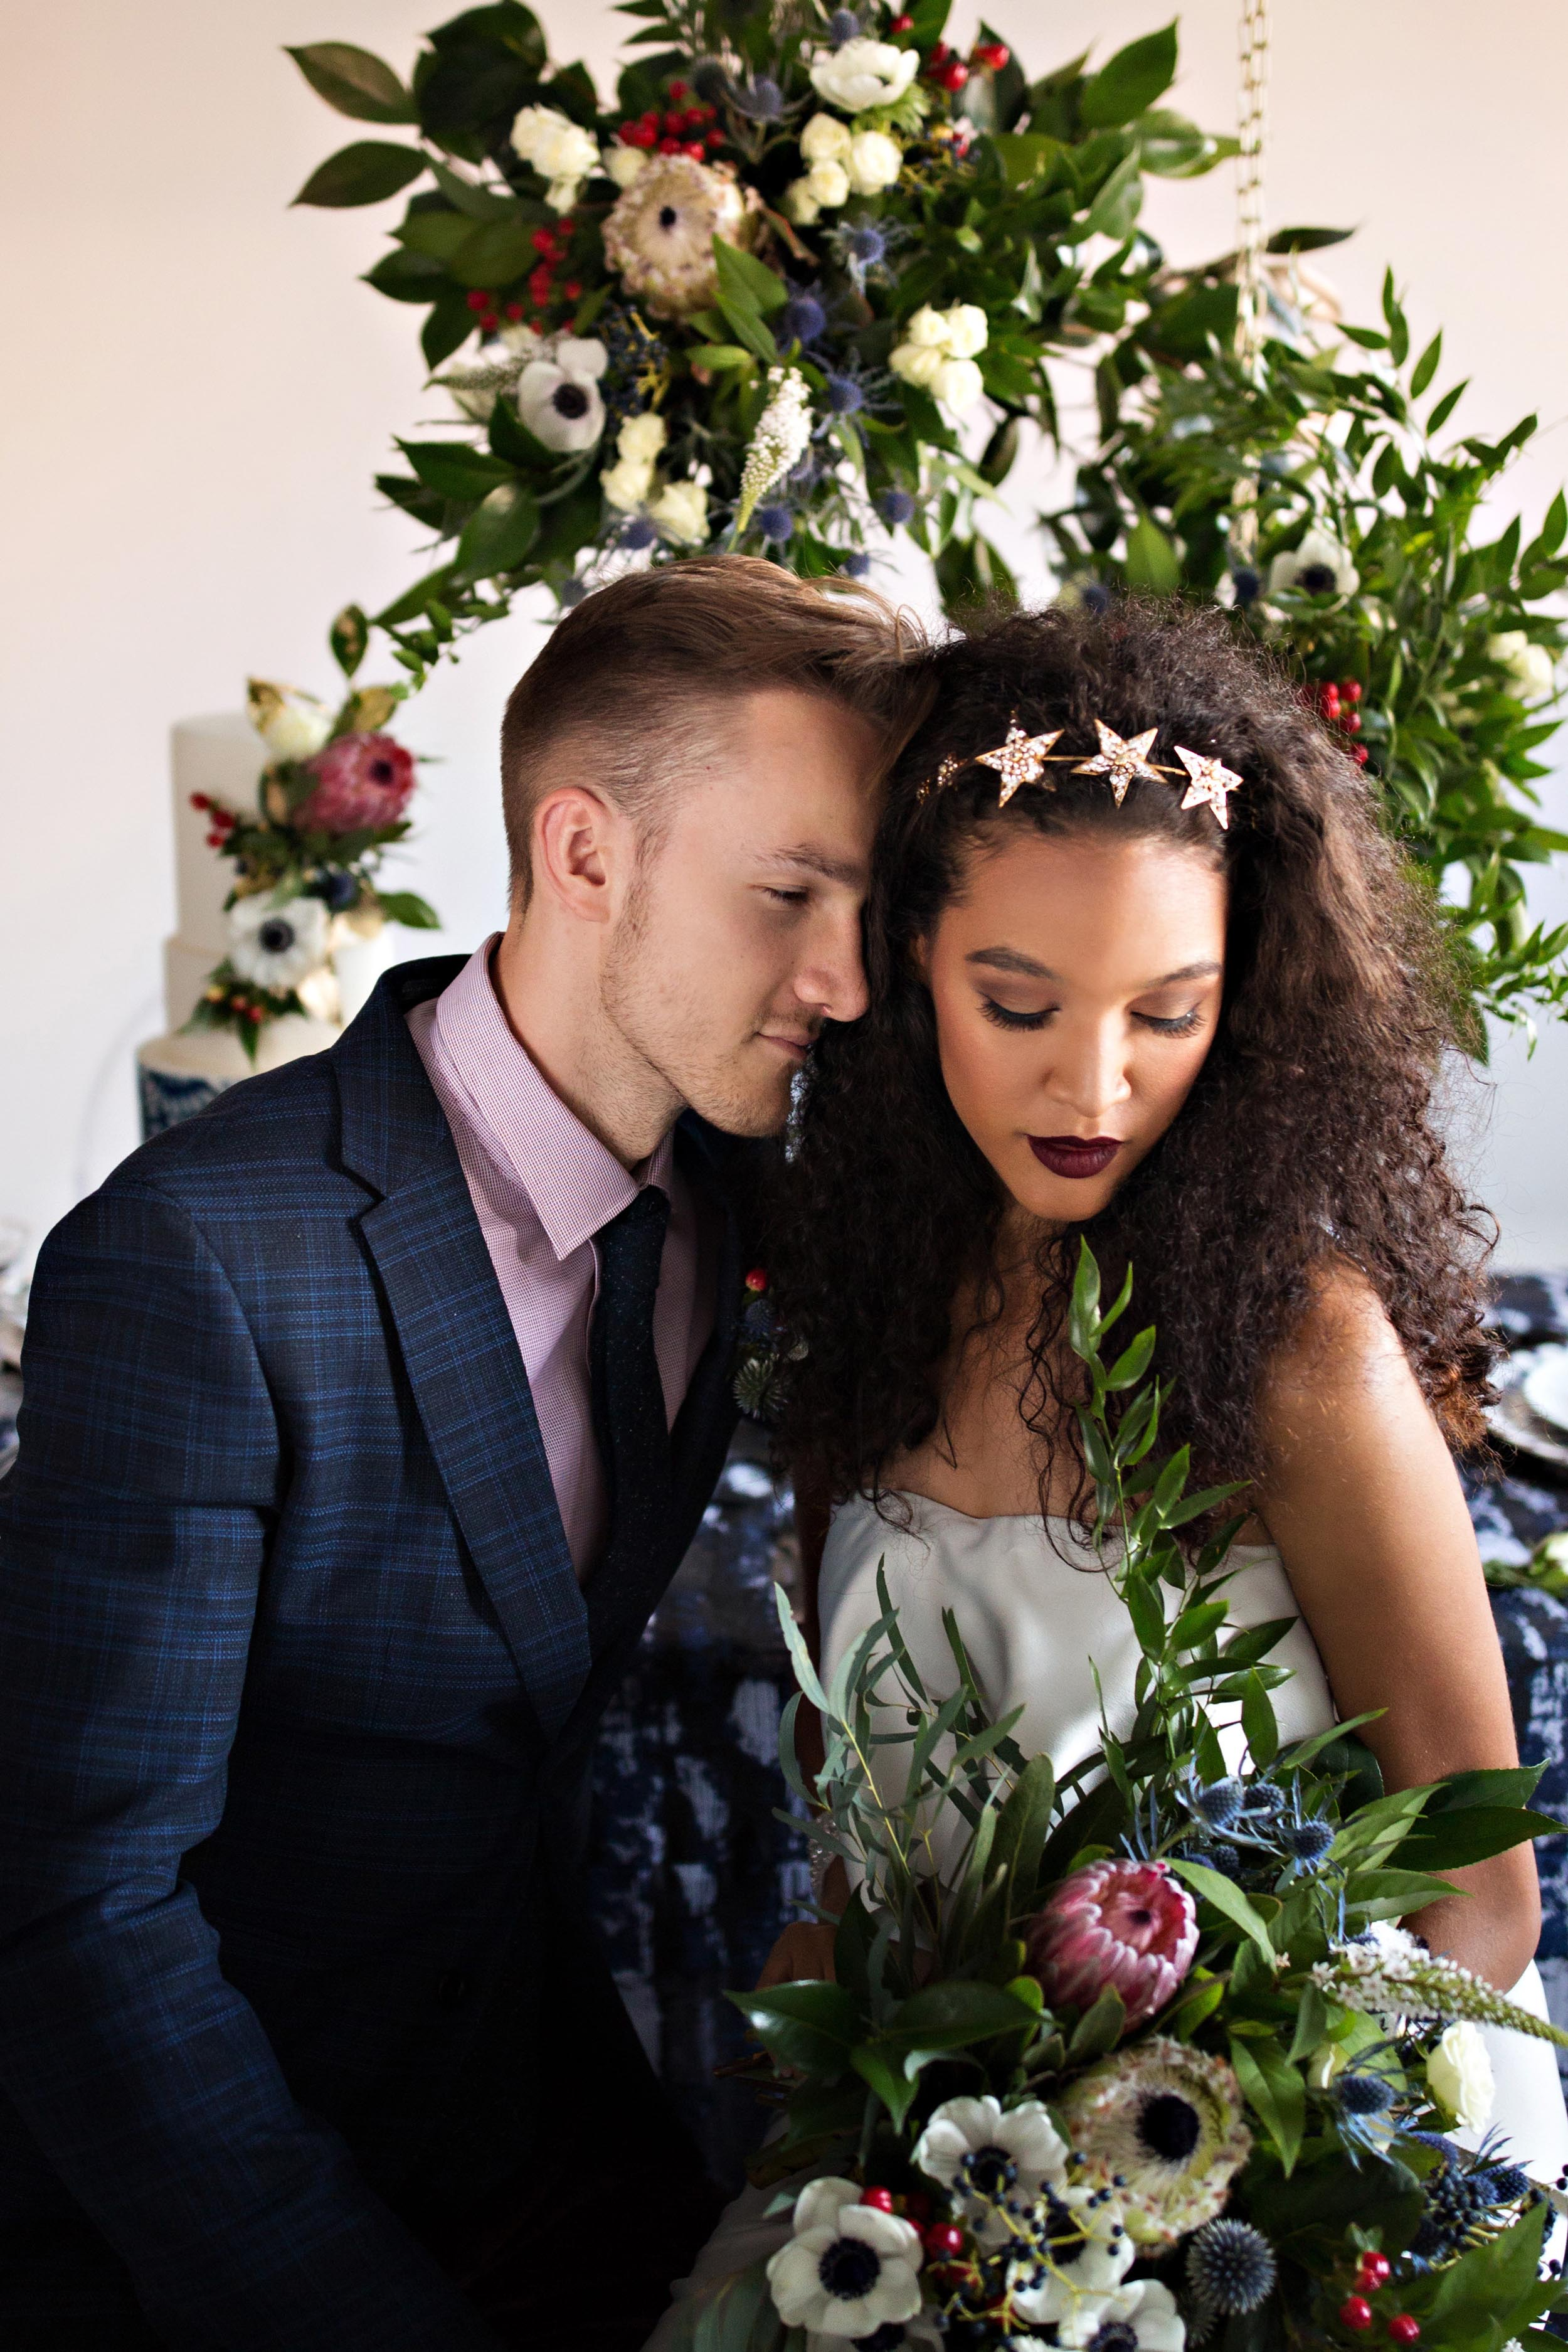 weddings-starsstripes-23.jpg